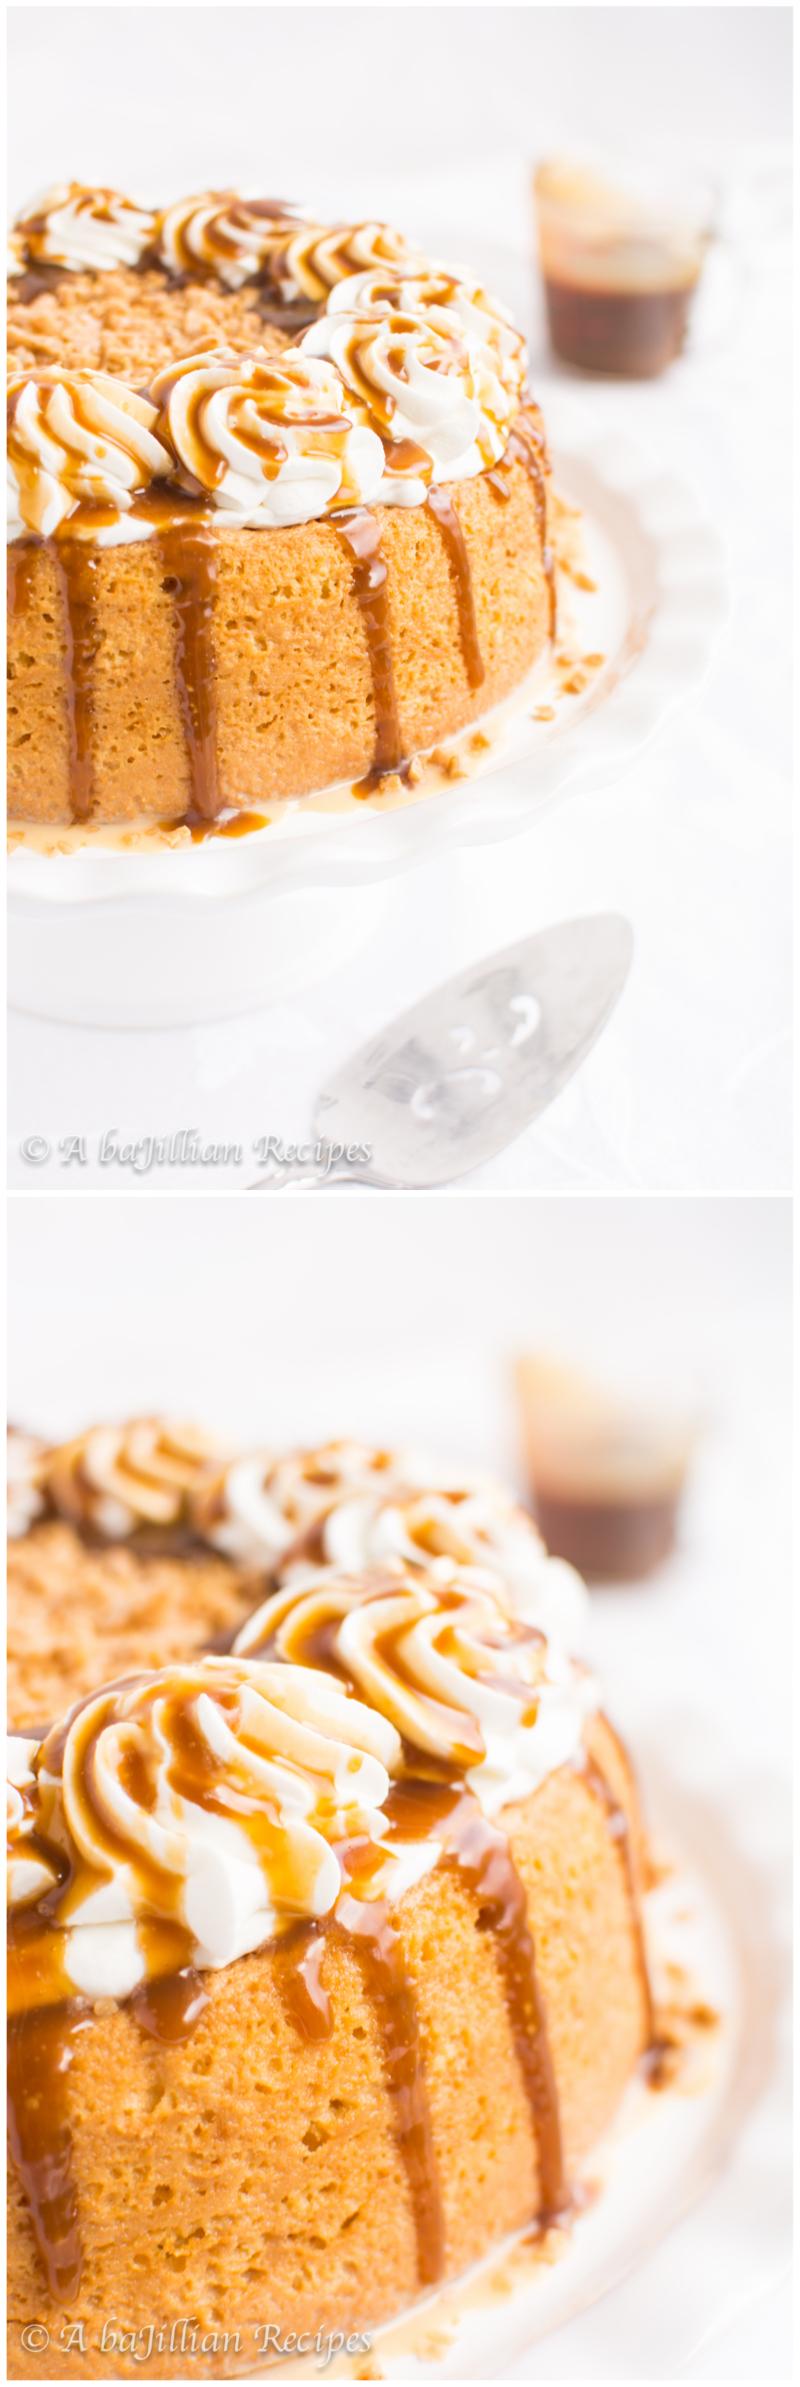 Toffee Tres Leches Cake - A baJillian Recipes2